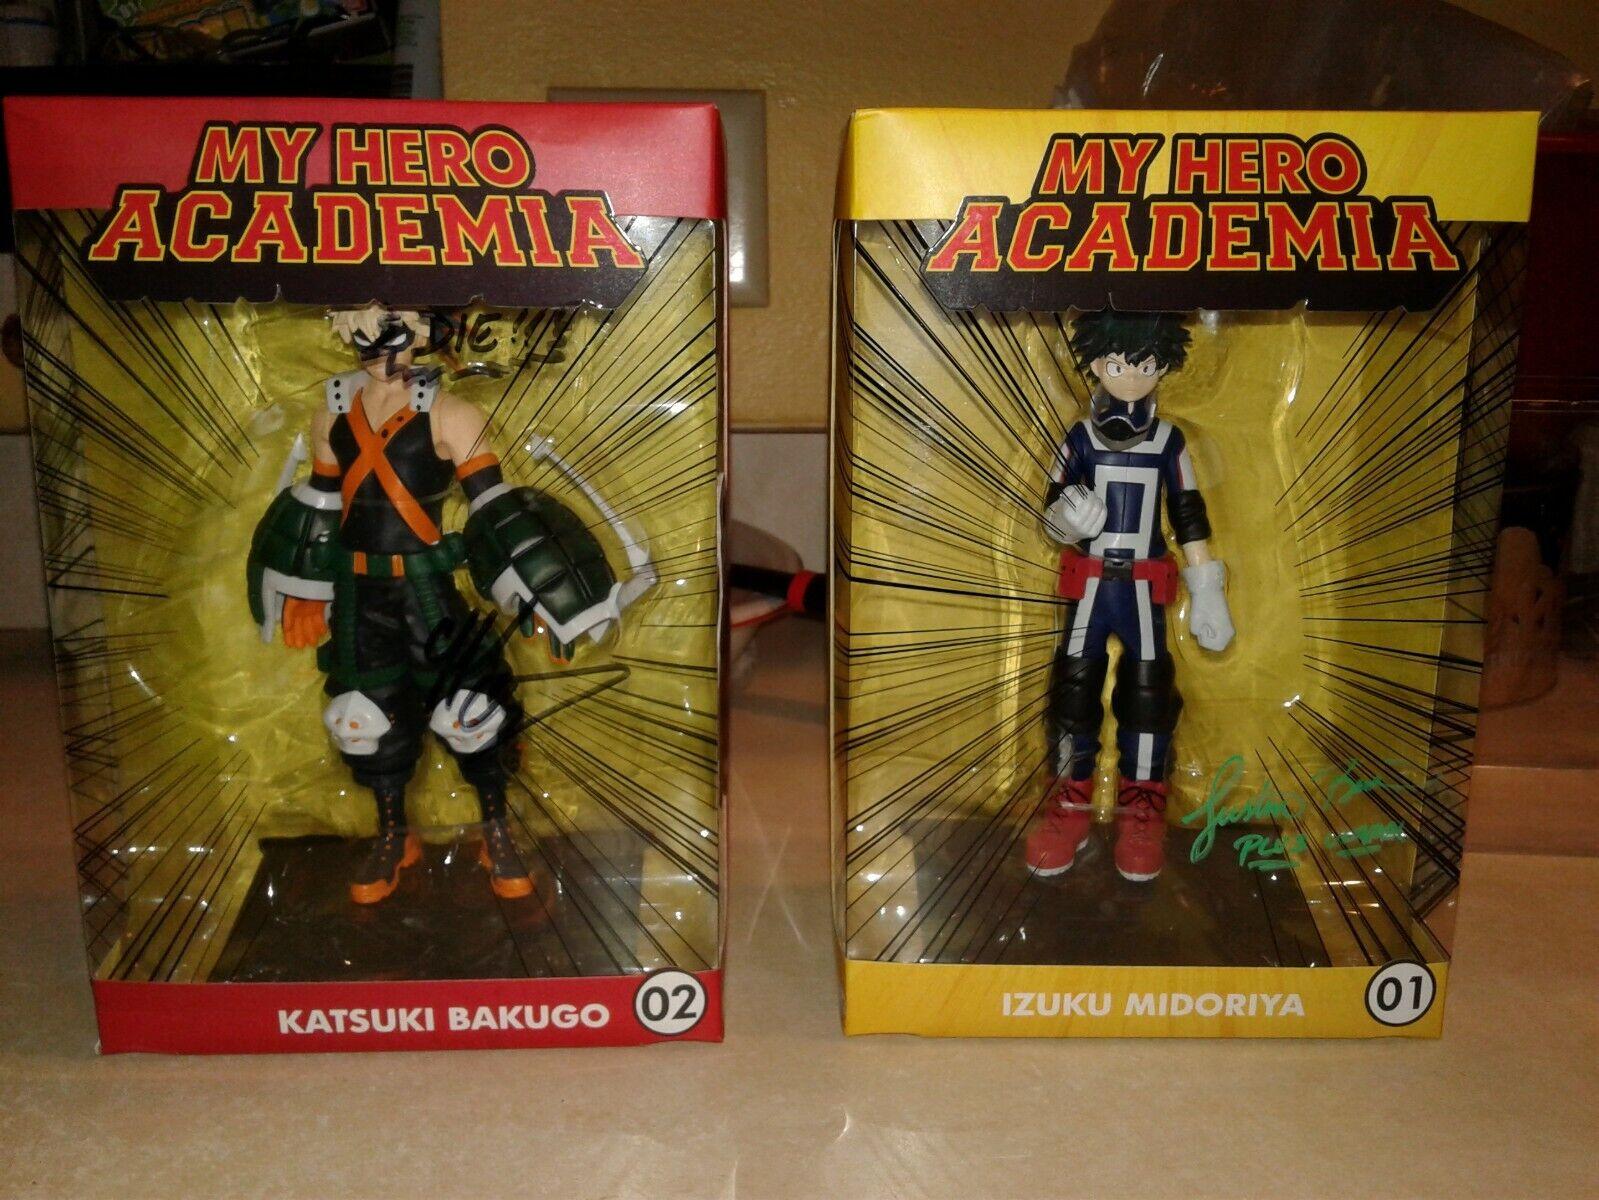 My Hero Academia KATSUKI BAKUGO & Izuku Midoriya Figure set(signed by voice act)